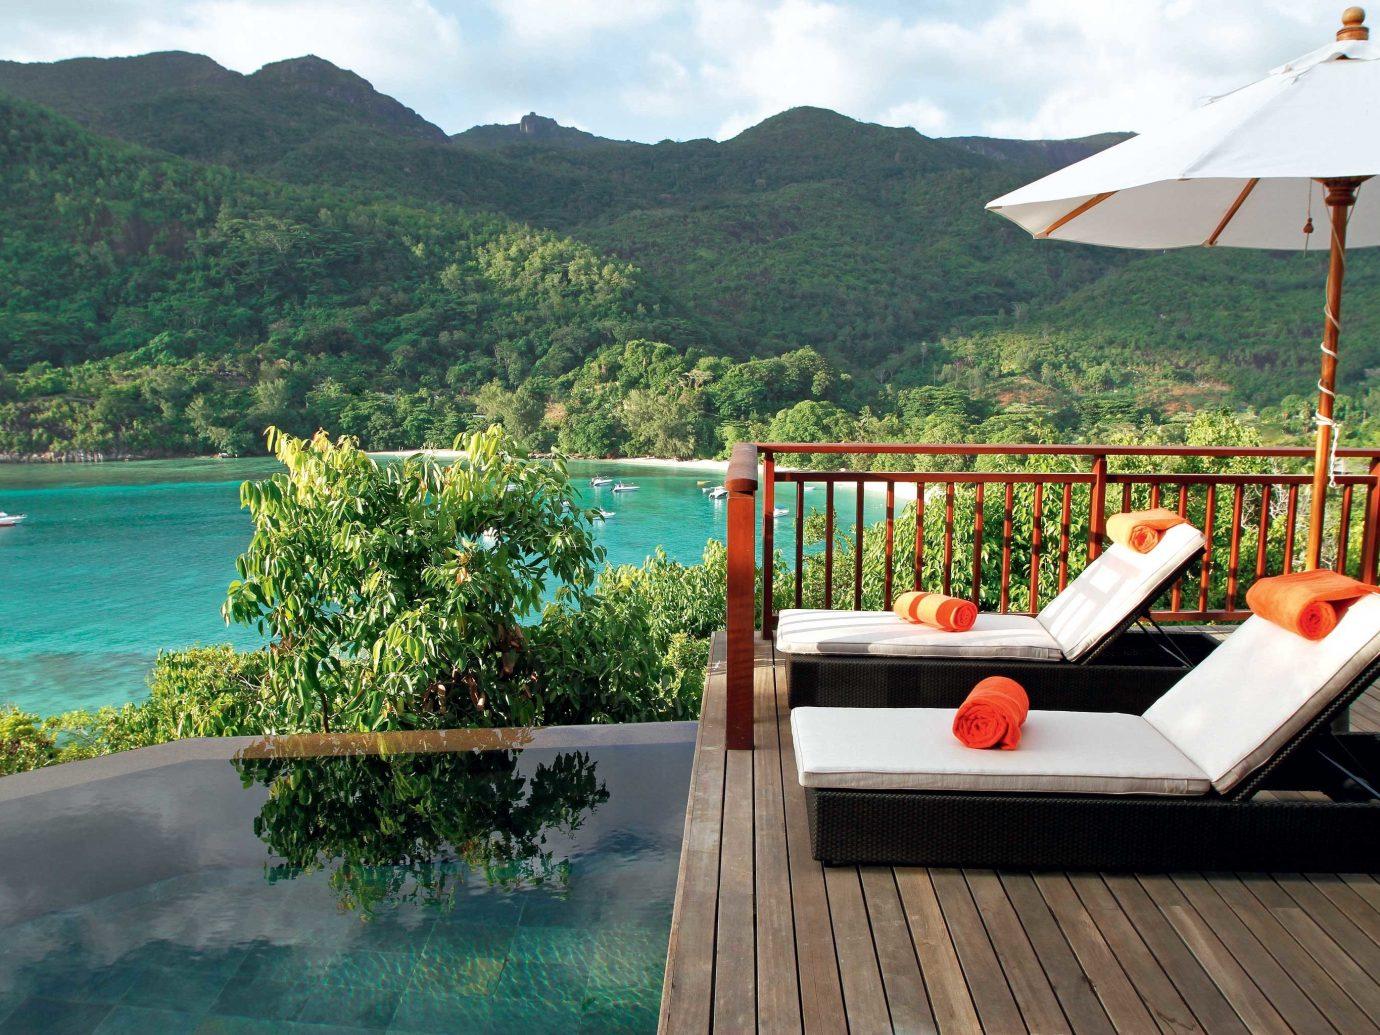 Trip Ideas mountain outdoor leisure swimming pool vacation Resort estate Villa Deck